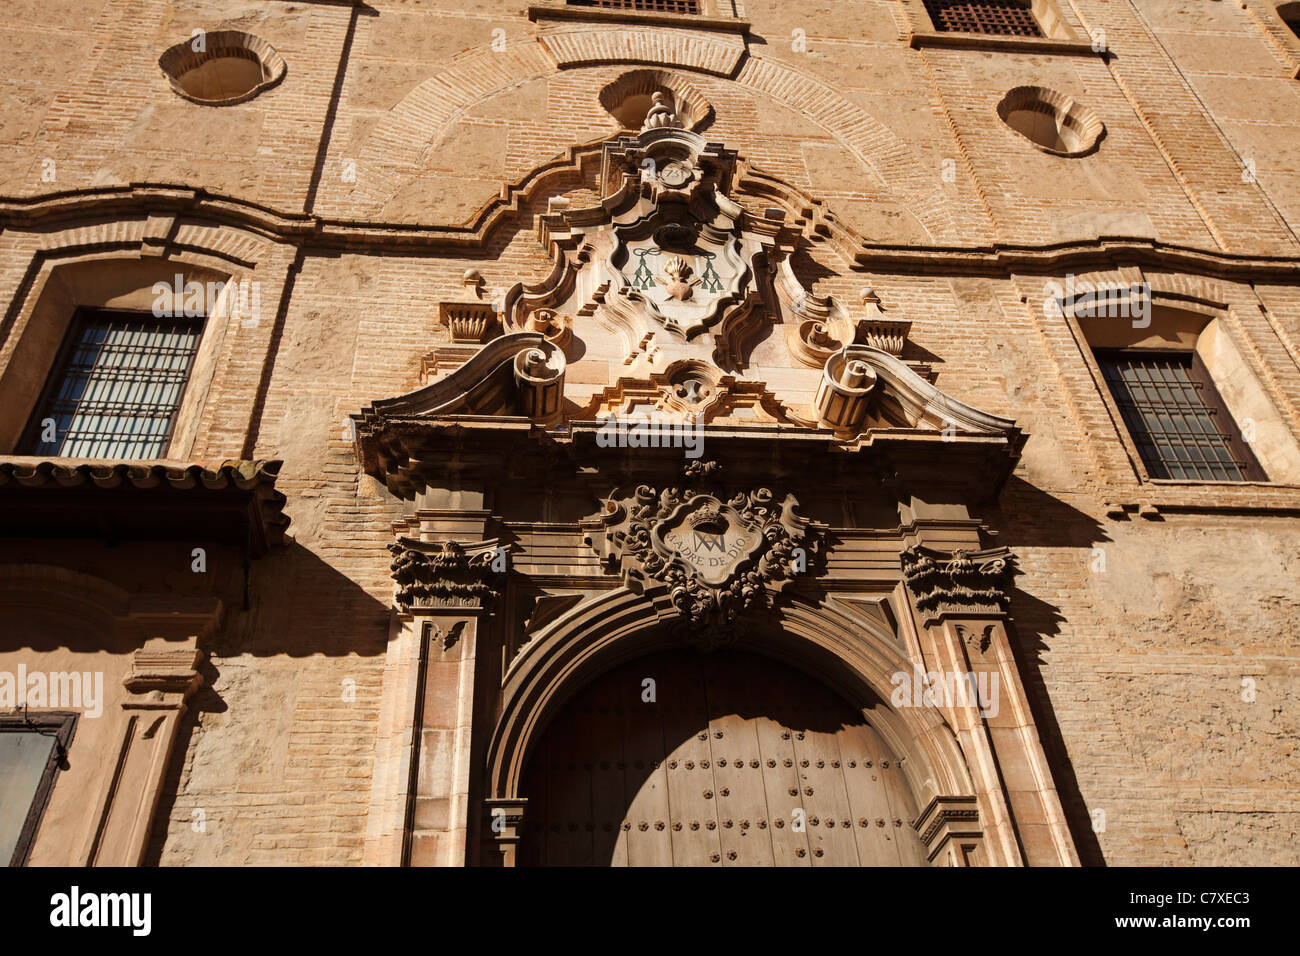 Convent Madre de Dios de Monteagudo Antequera Malaga Andalusia Spain - Stock Image